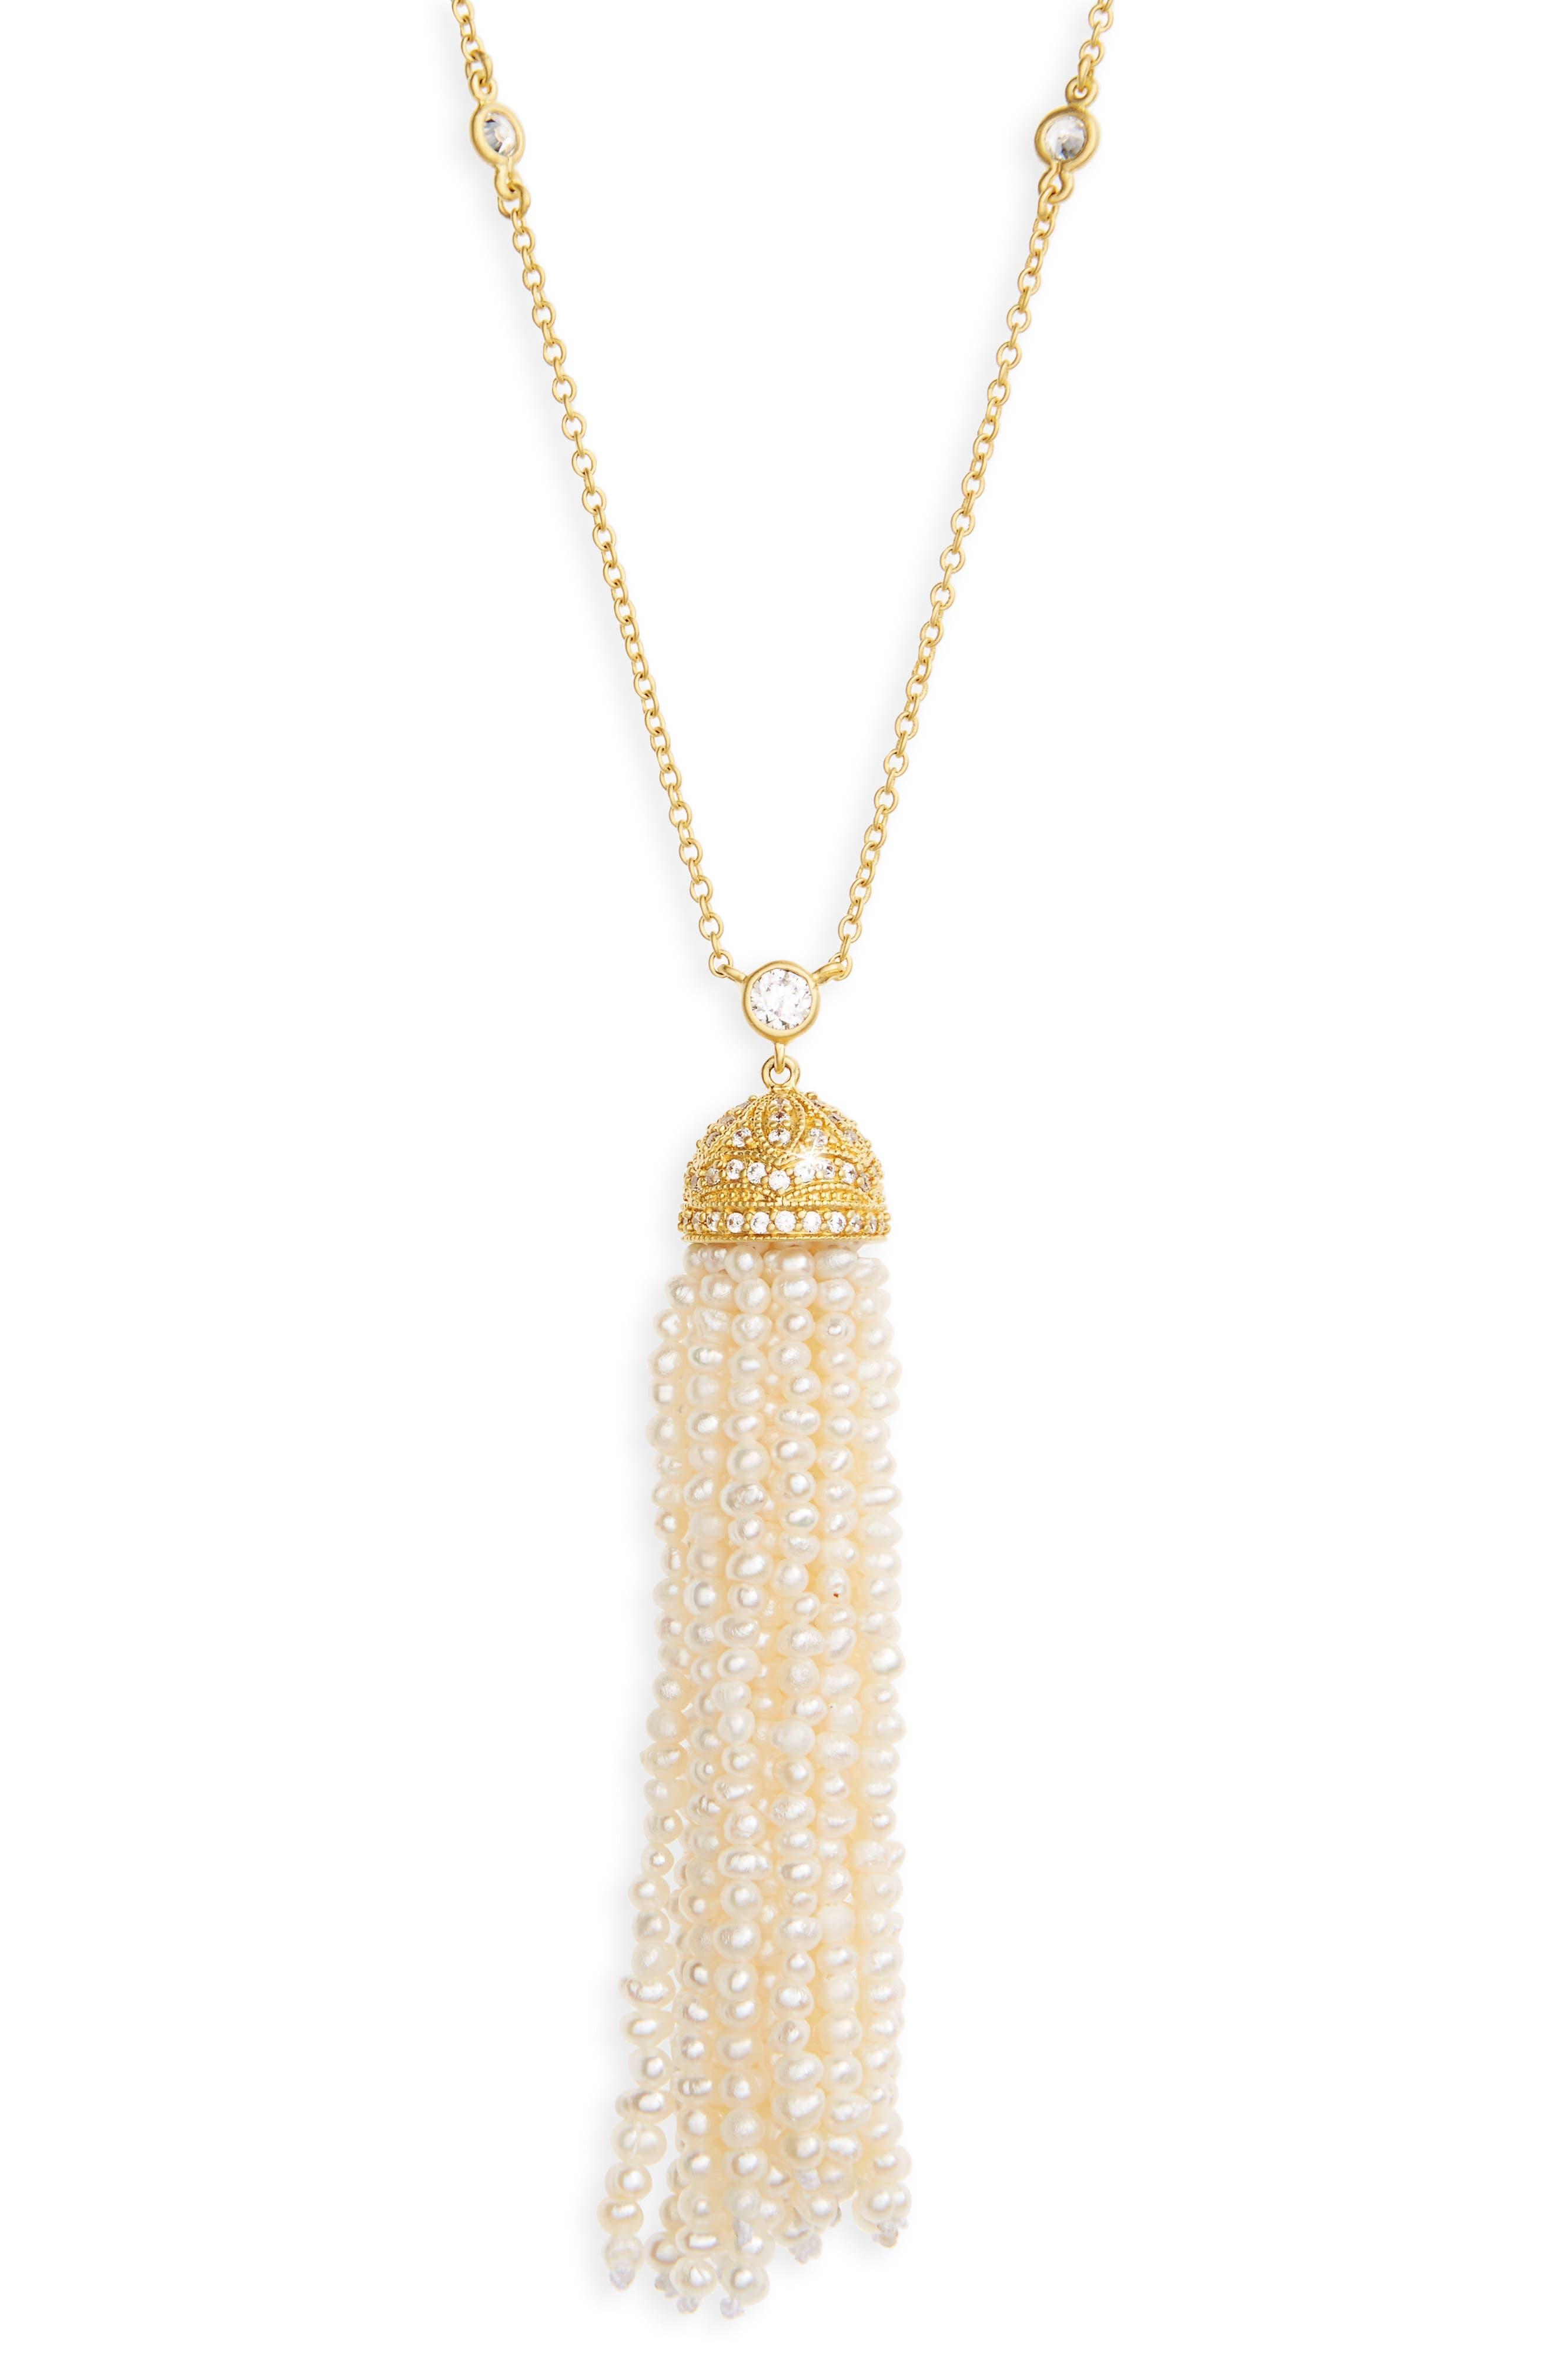 Audrey Tassel Pendant Pearl Necklace,                             Alternate thumbnail 2, color,                             Gold/ Pearl